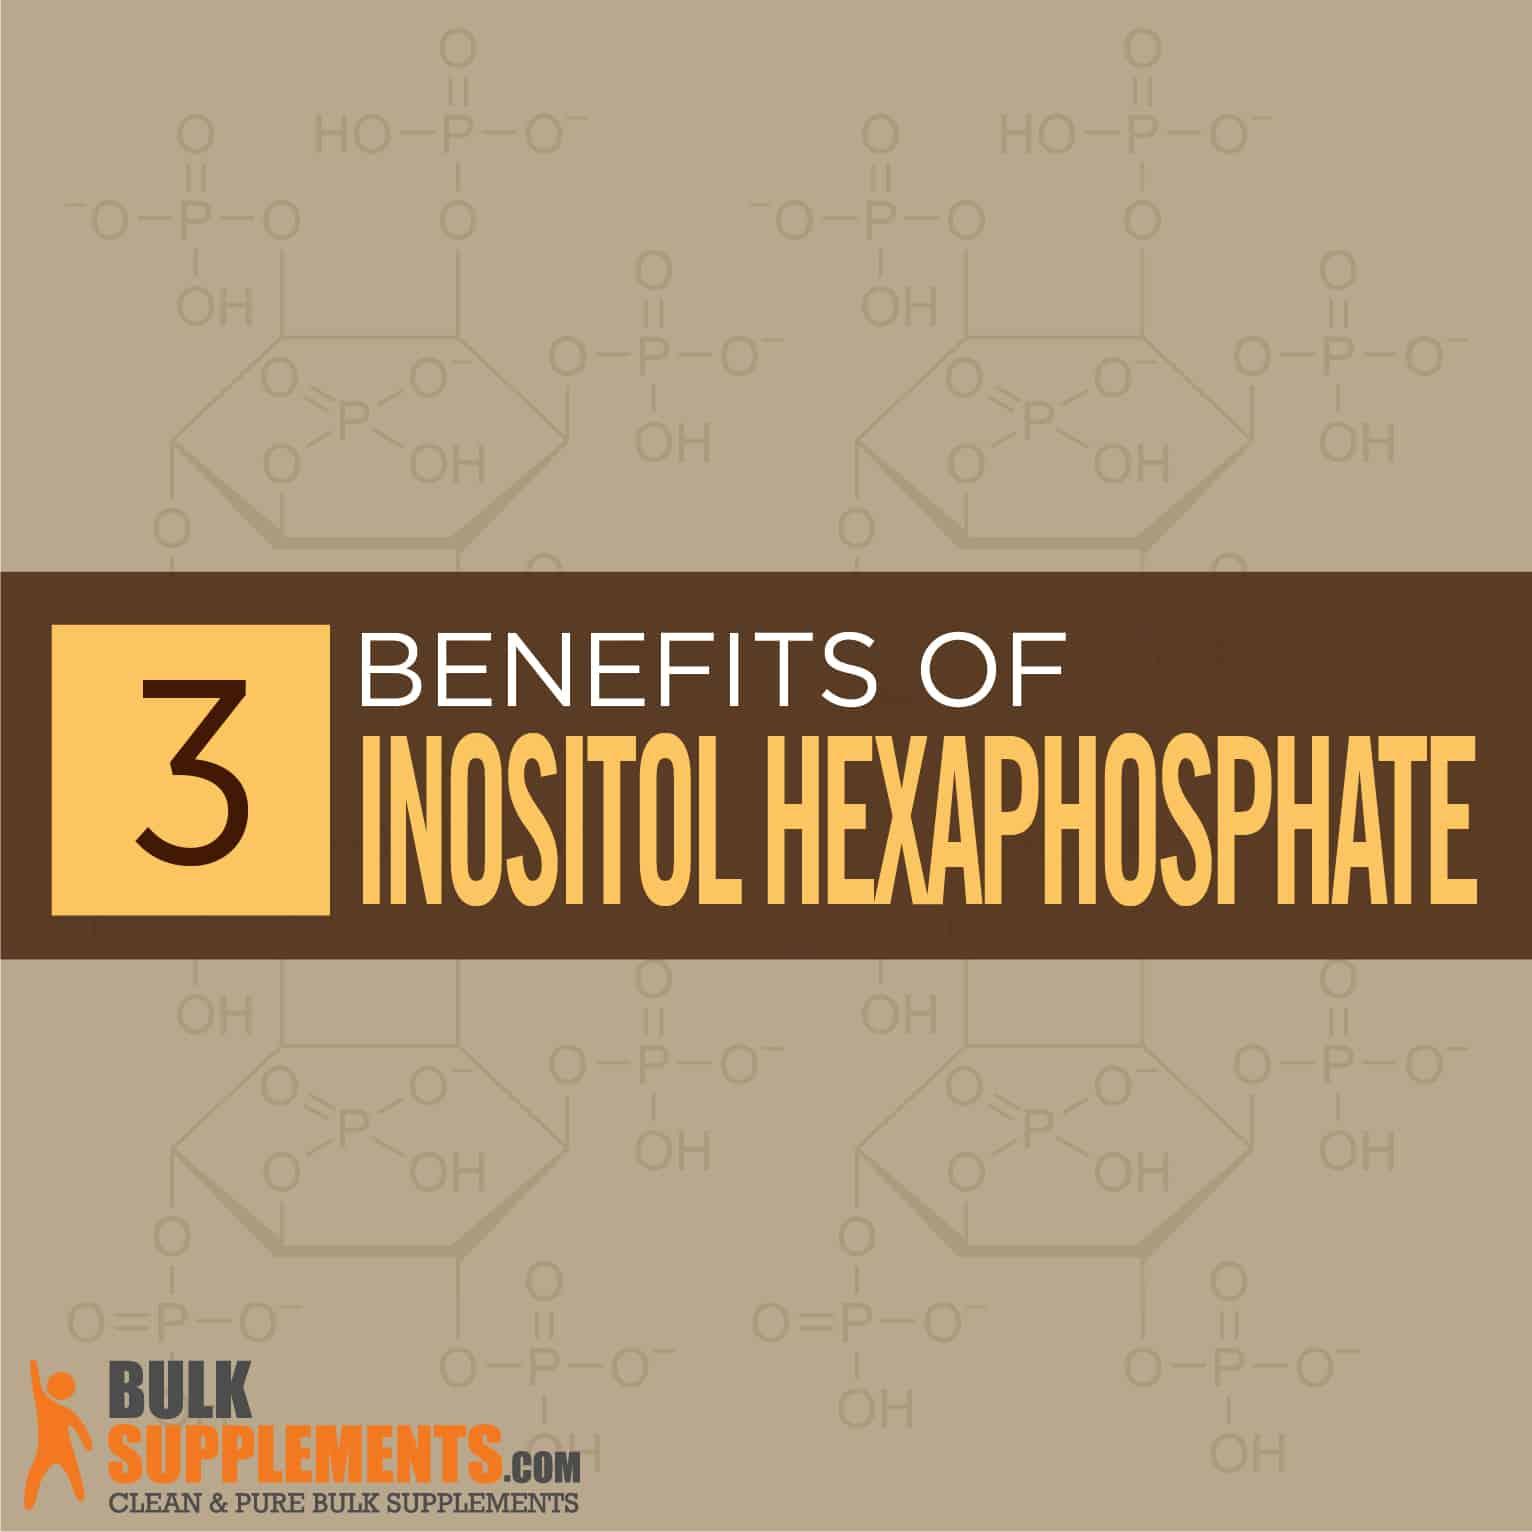 Inositol Hexaphosphate